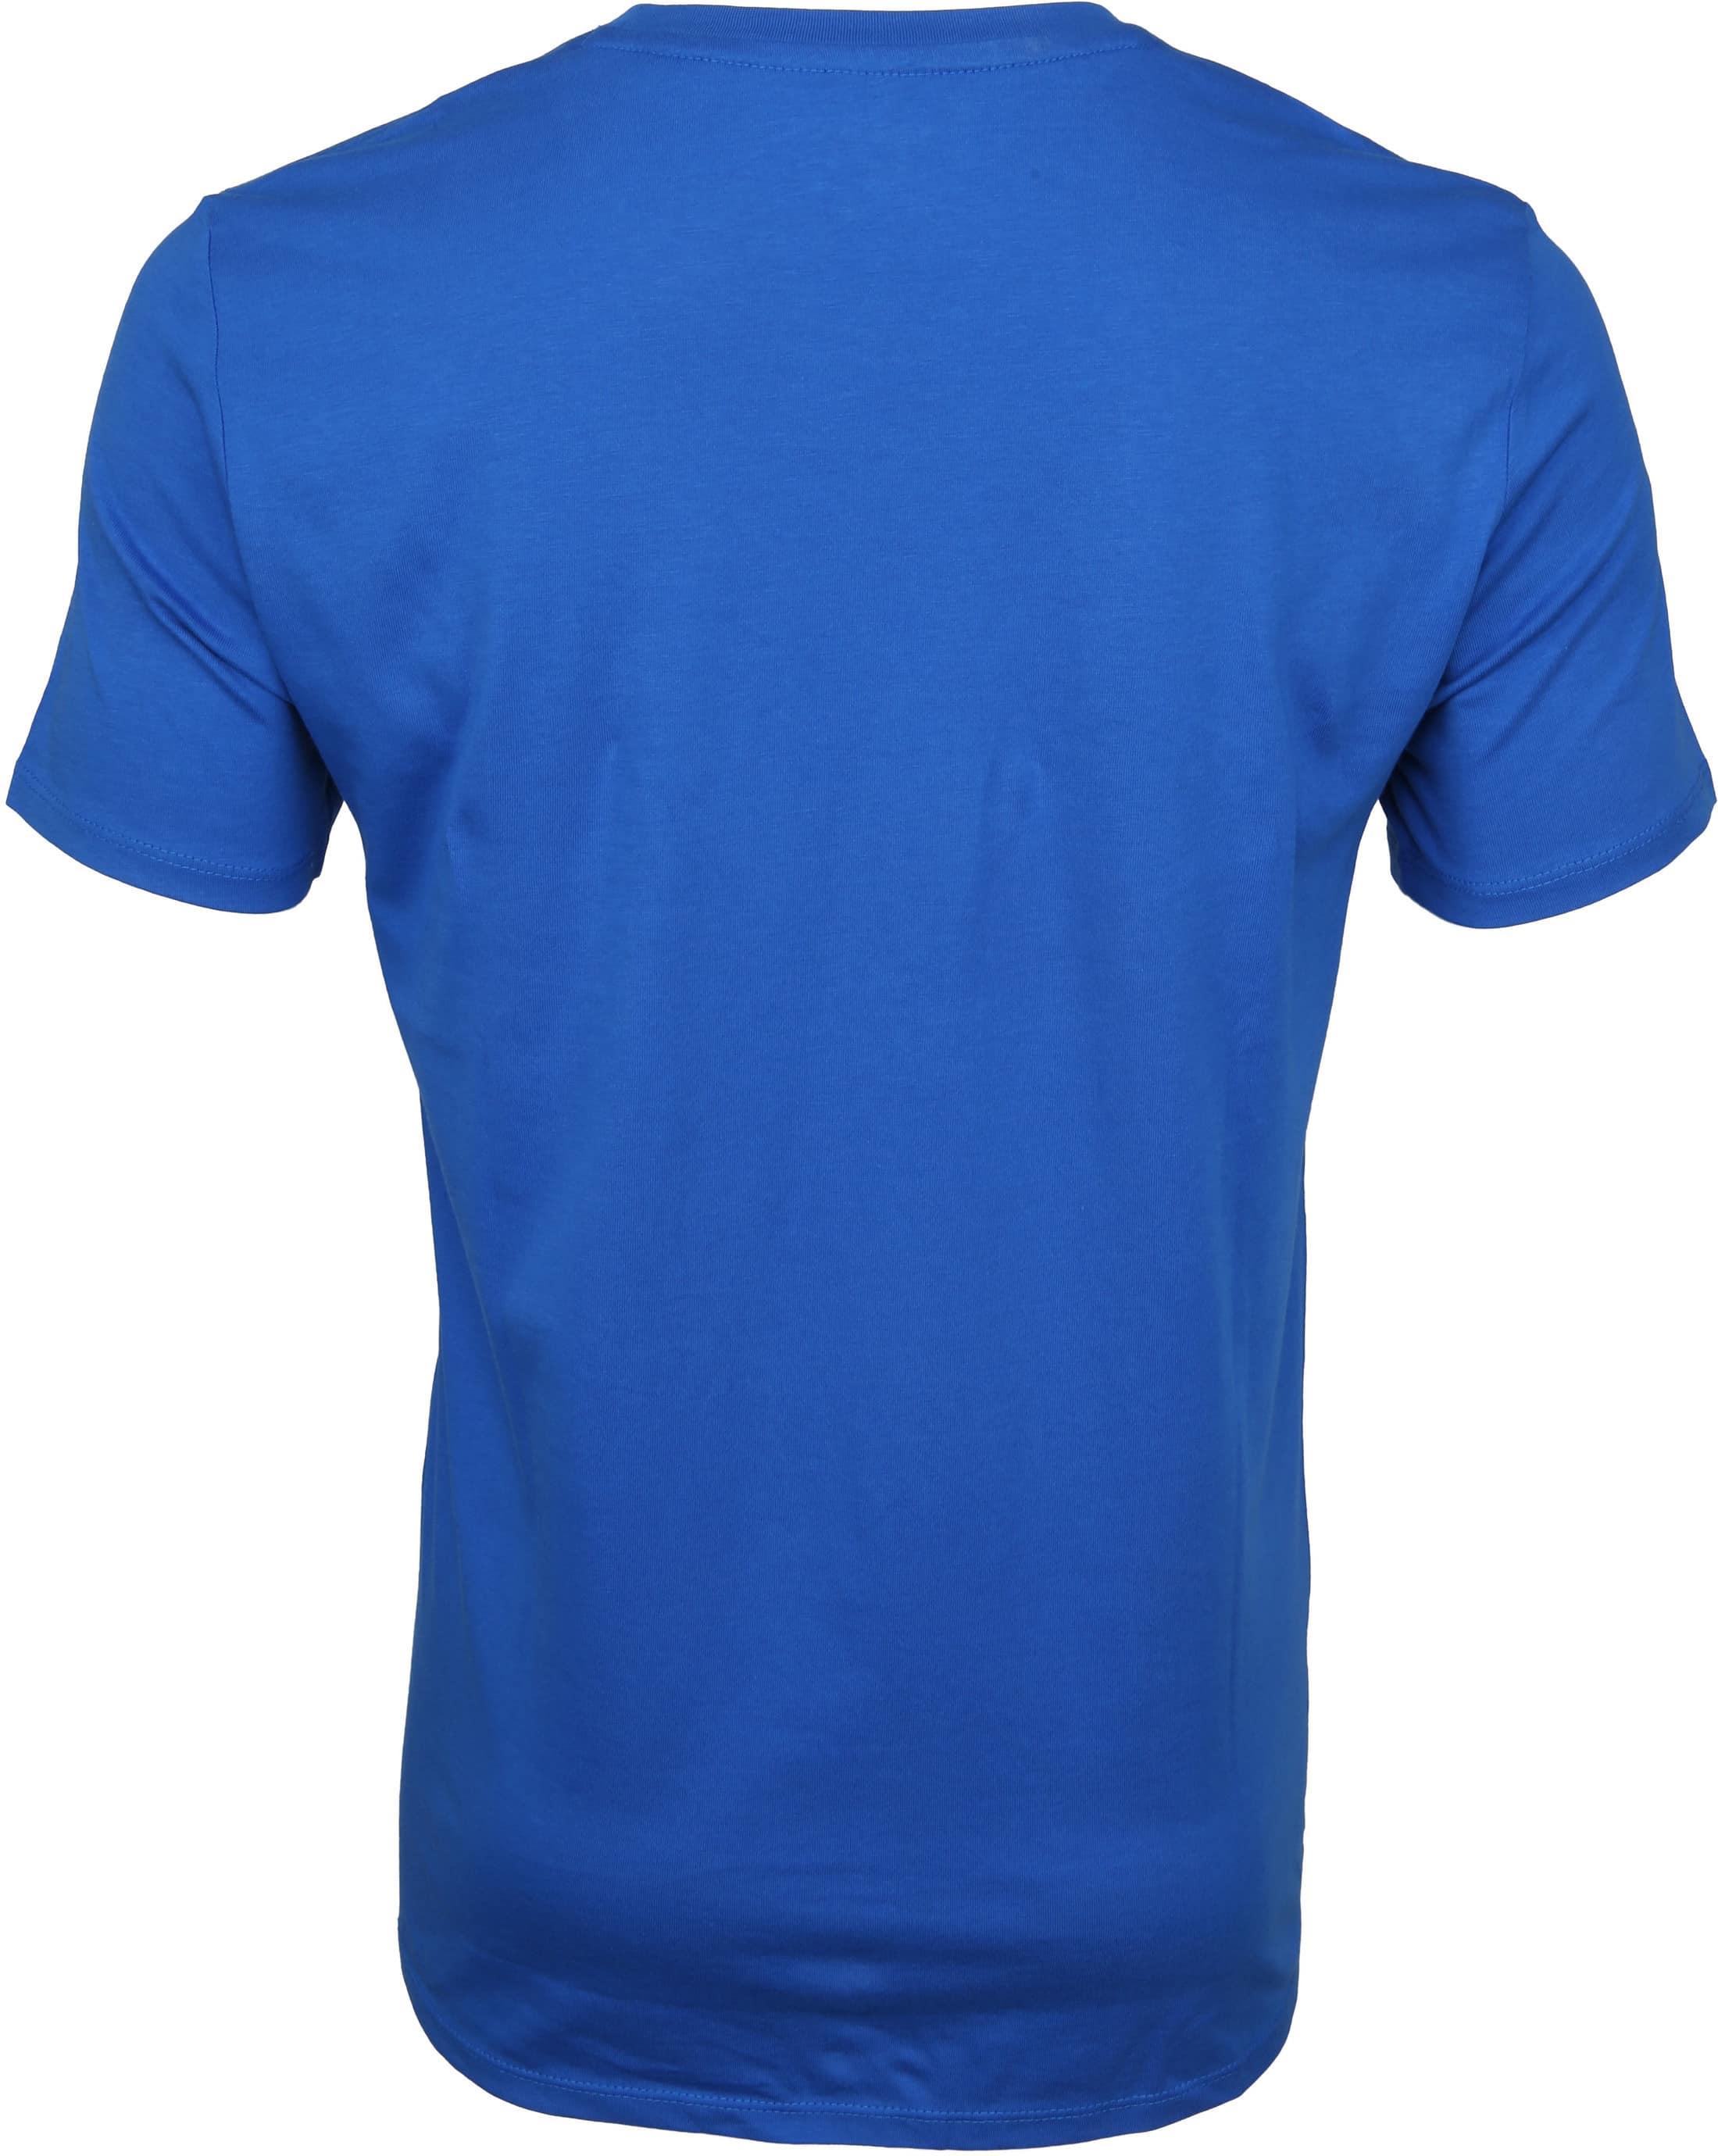 Marc O'Polo T-Shirt Victoria Blau foto 2